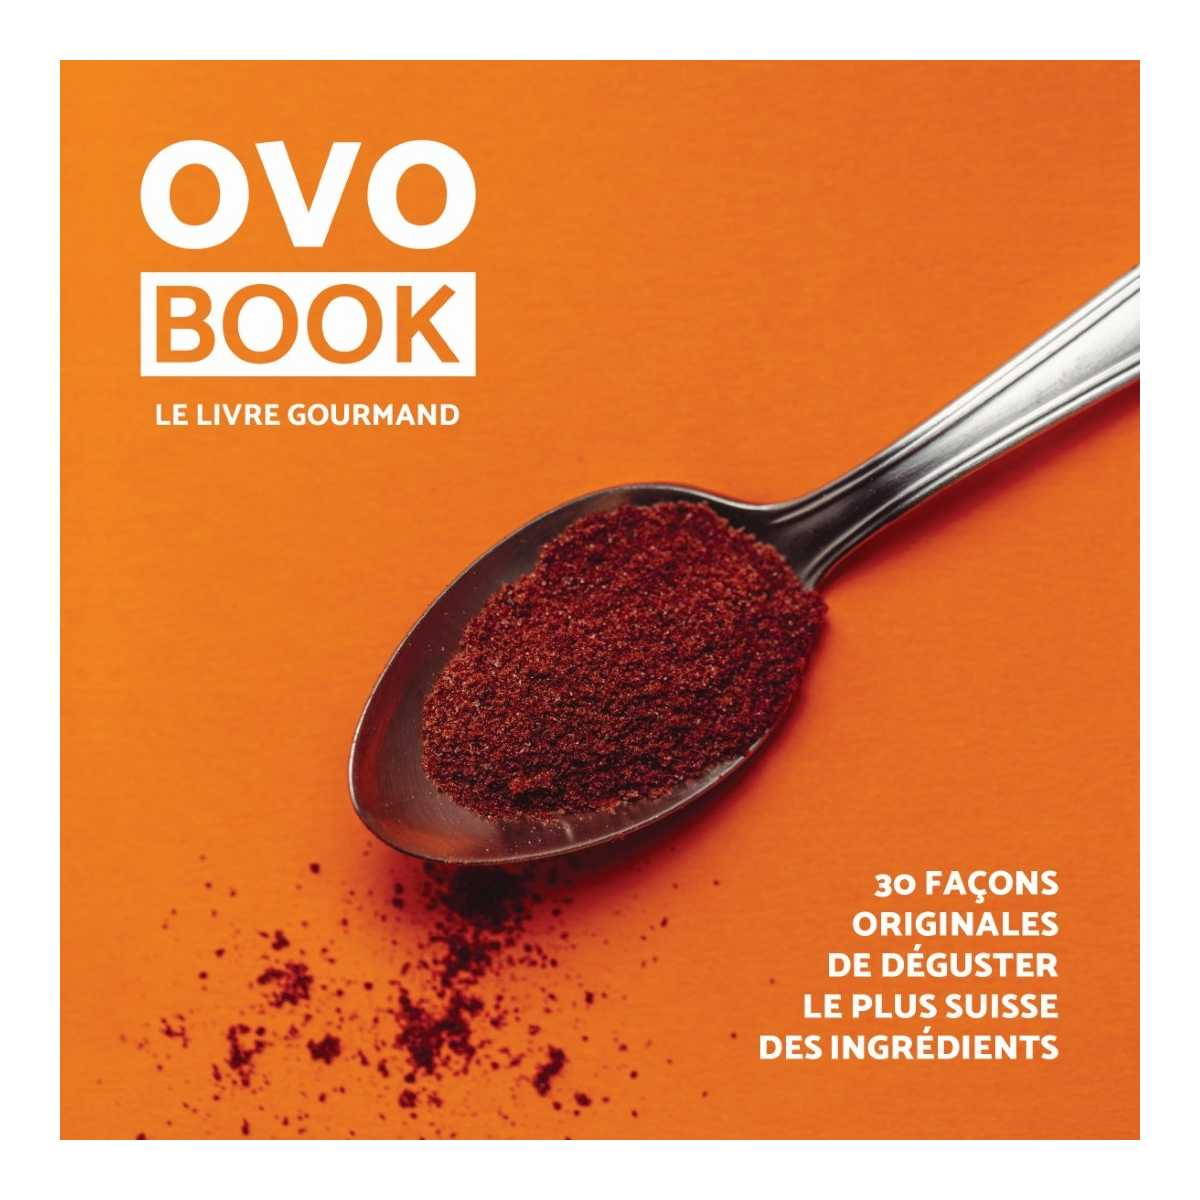 Ovo Book - Helvetiq - Livres - HELV07